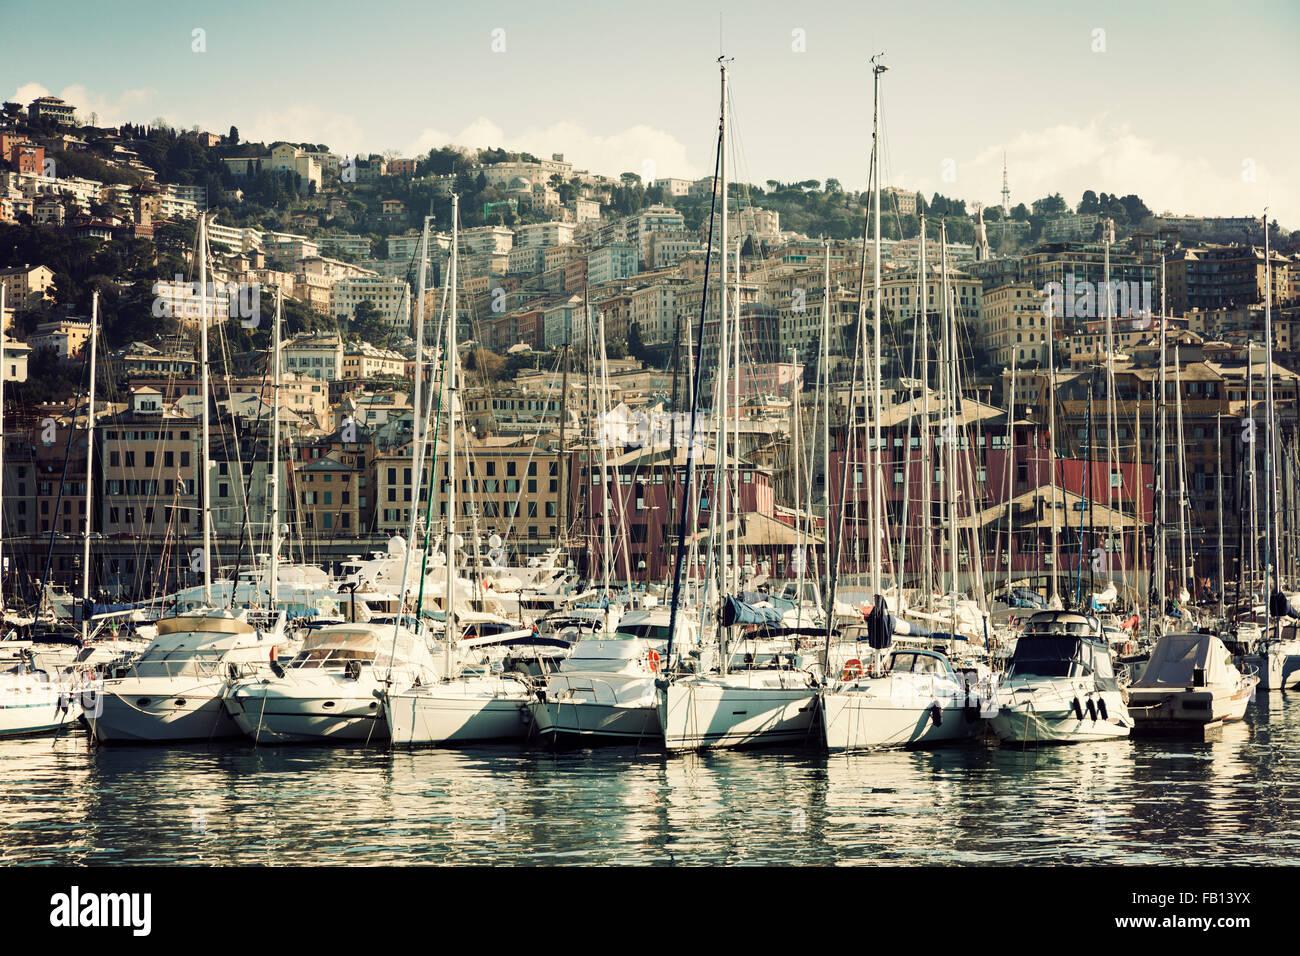 Yachts in Genoa harbor - Stock Image